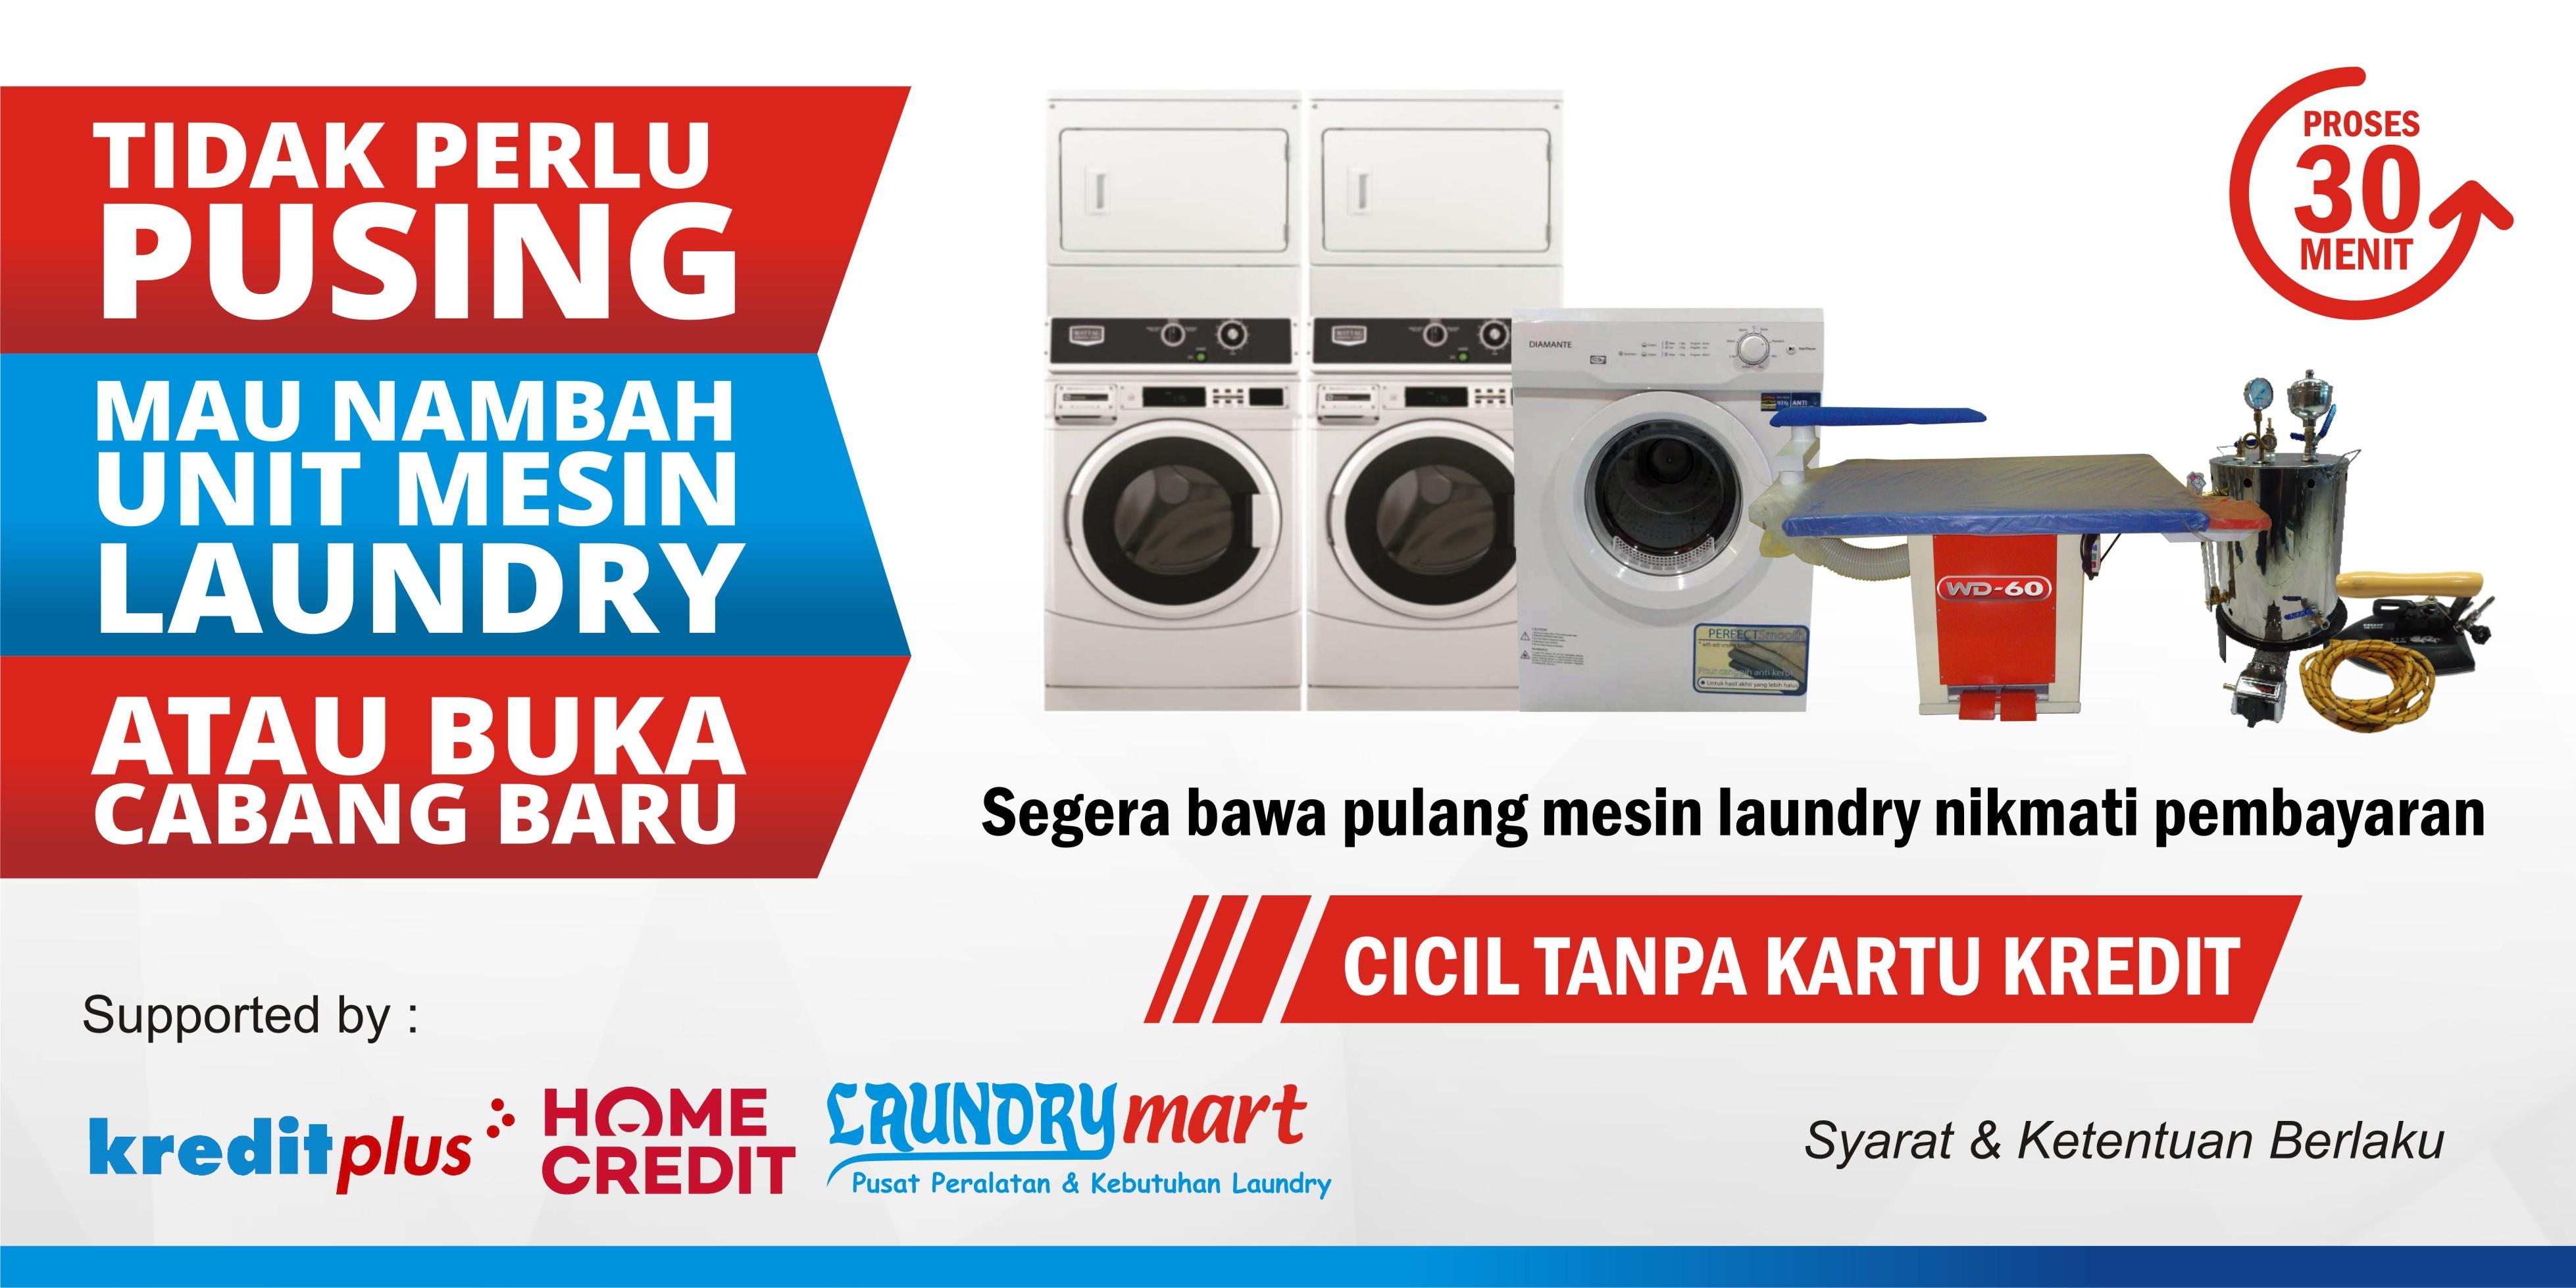 2 Promo Cicilan kartu kredit kreditplus homecredit laundry mart laundrymart mesin laundry usaha laundry bisnis laundry peluang usaha laundry - Beranda